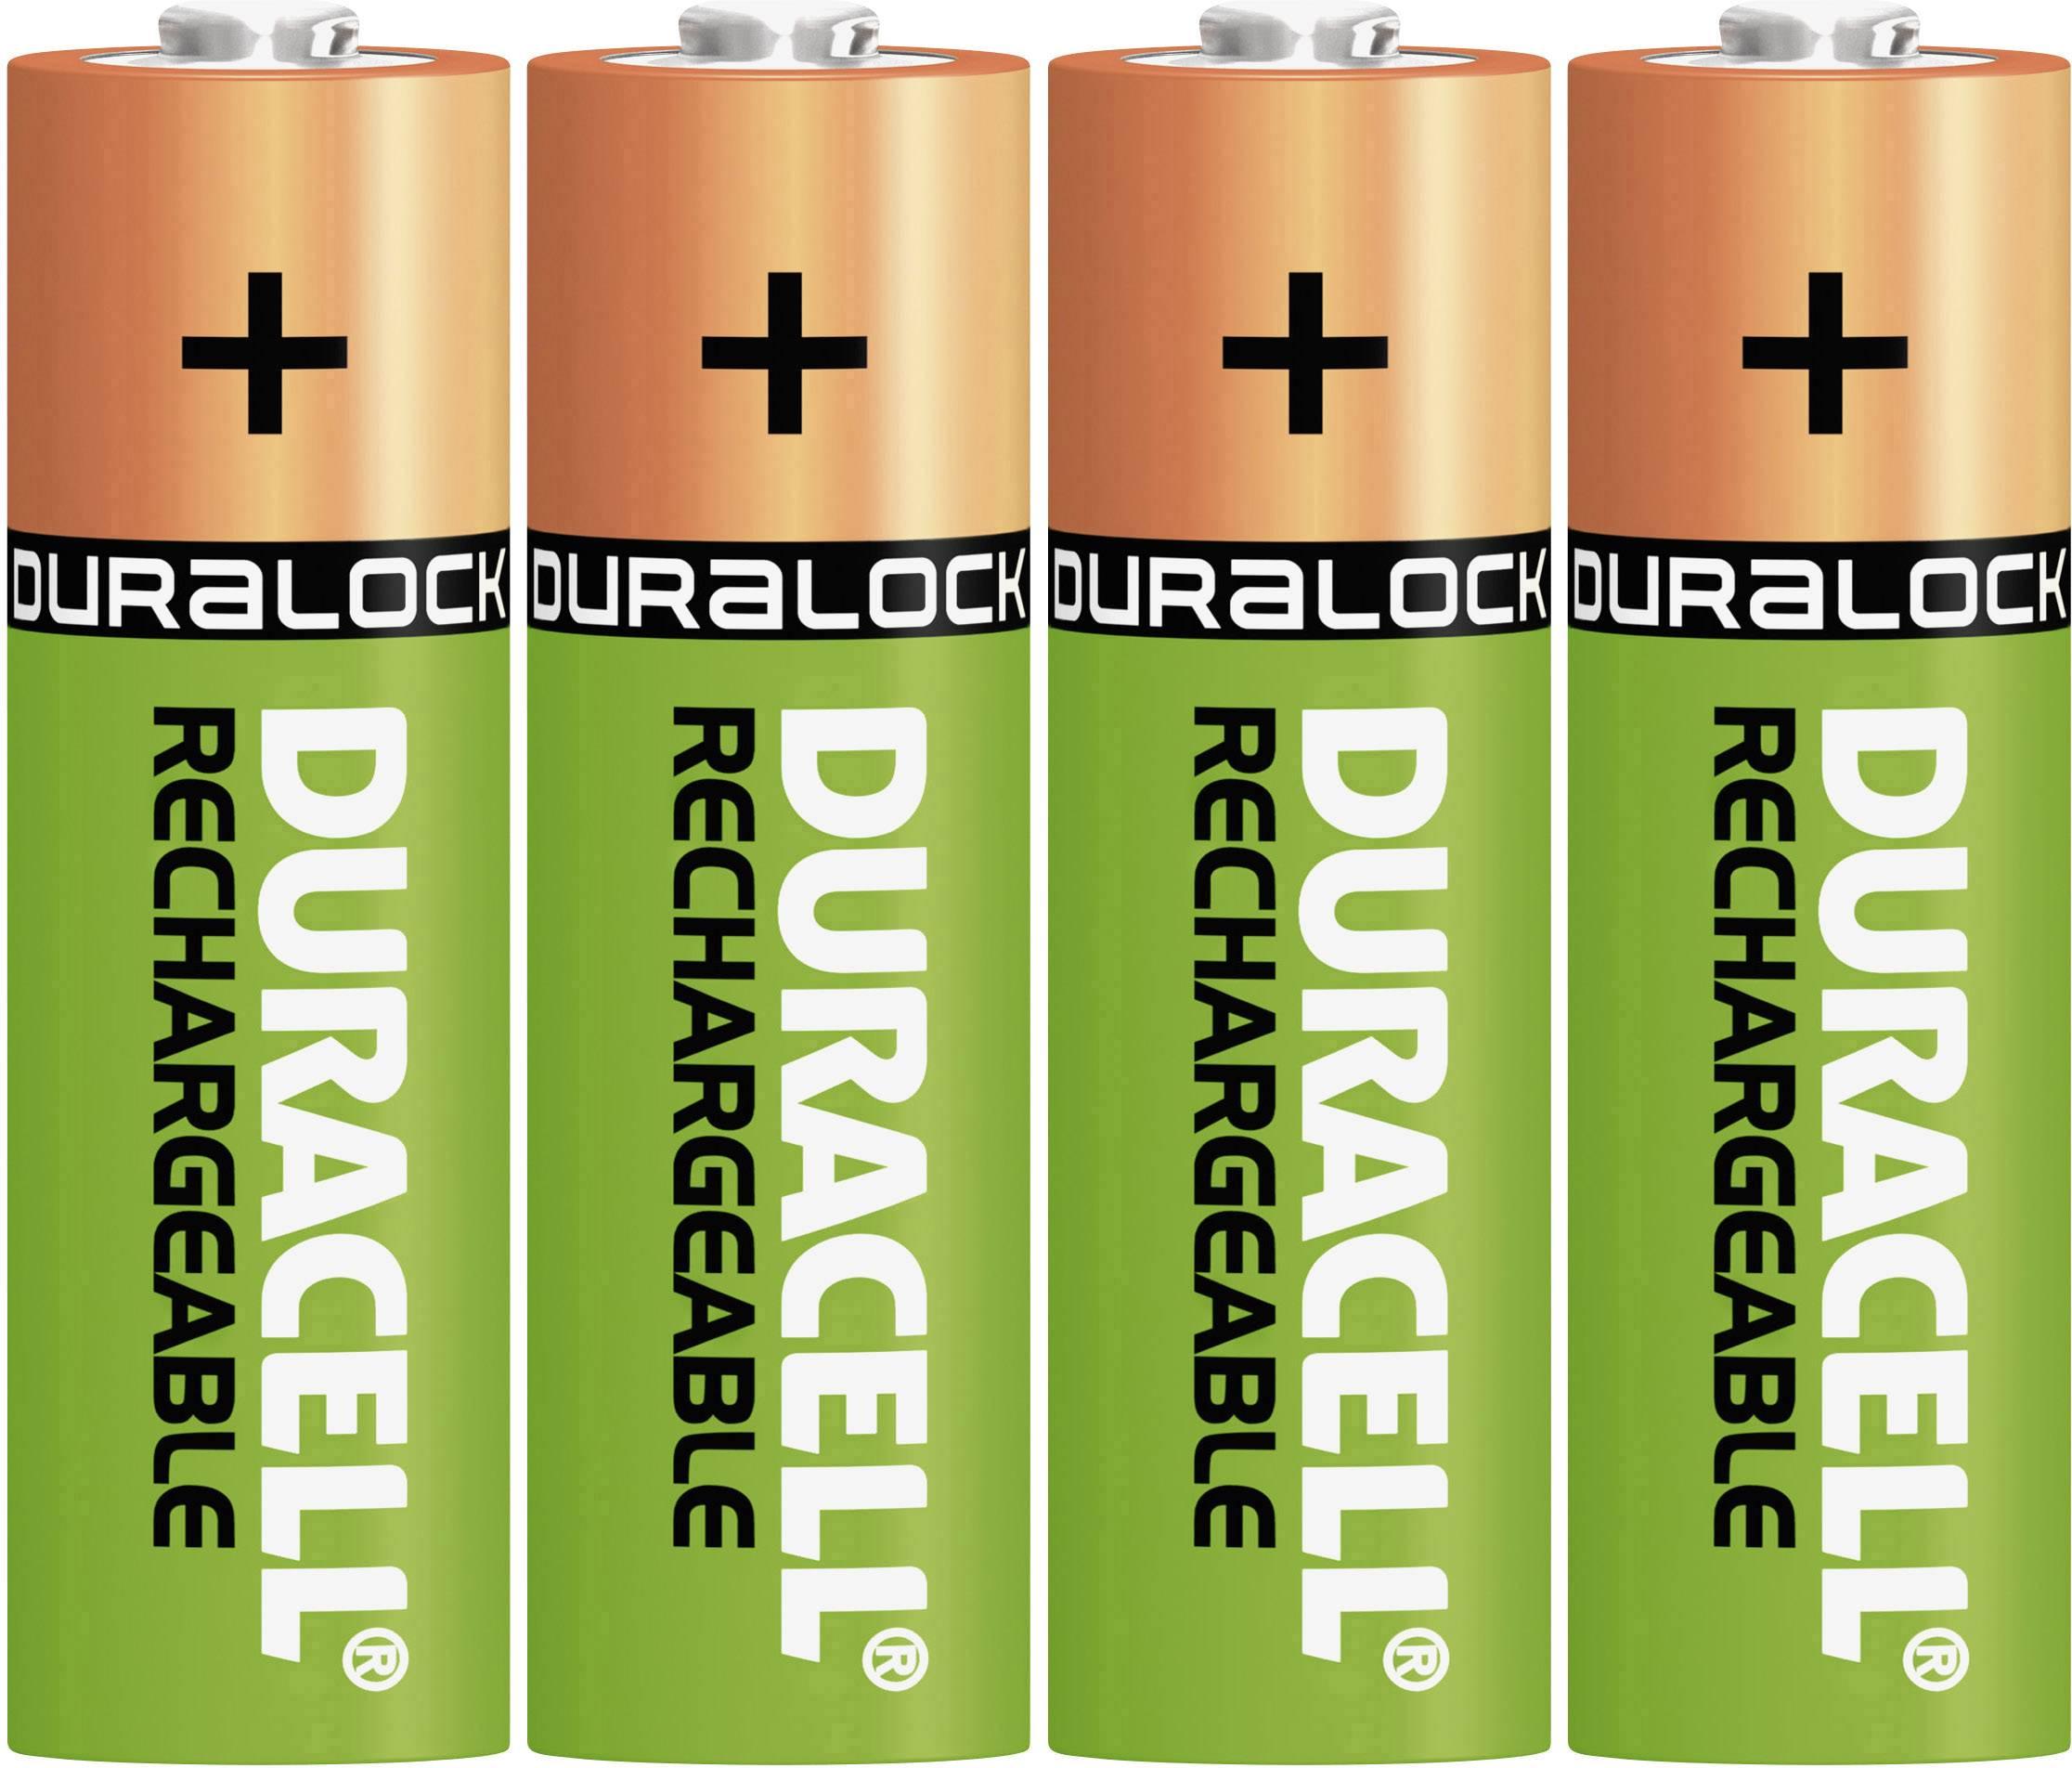 Tužkový akumulátor typu AA NiMH Duracell StayCharged HR06 DUR039247, 1300 mAh, 1.2 V, 4 ks